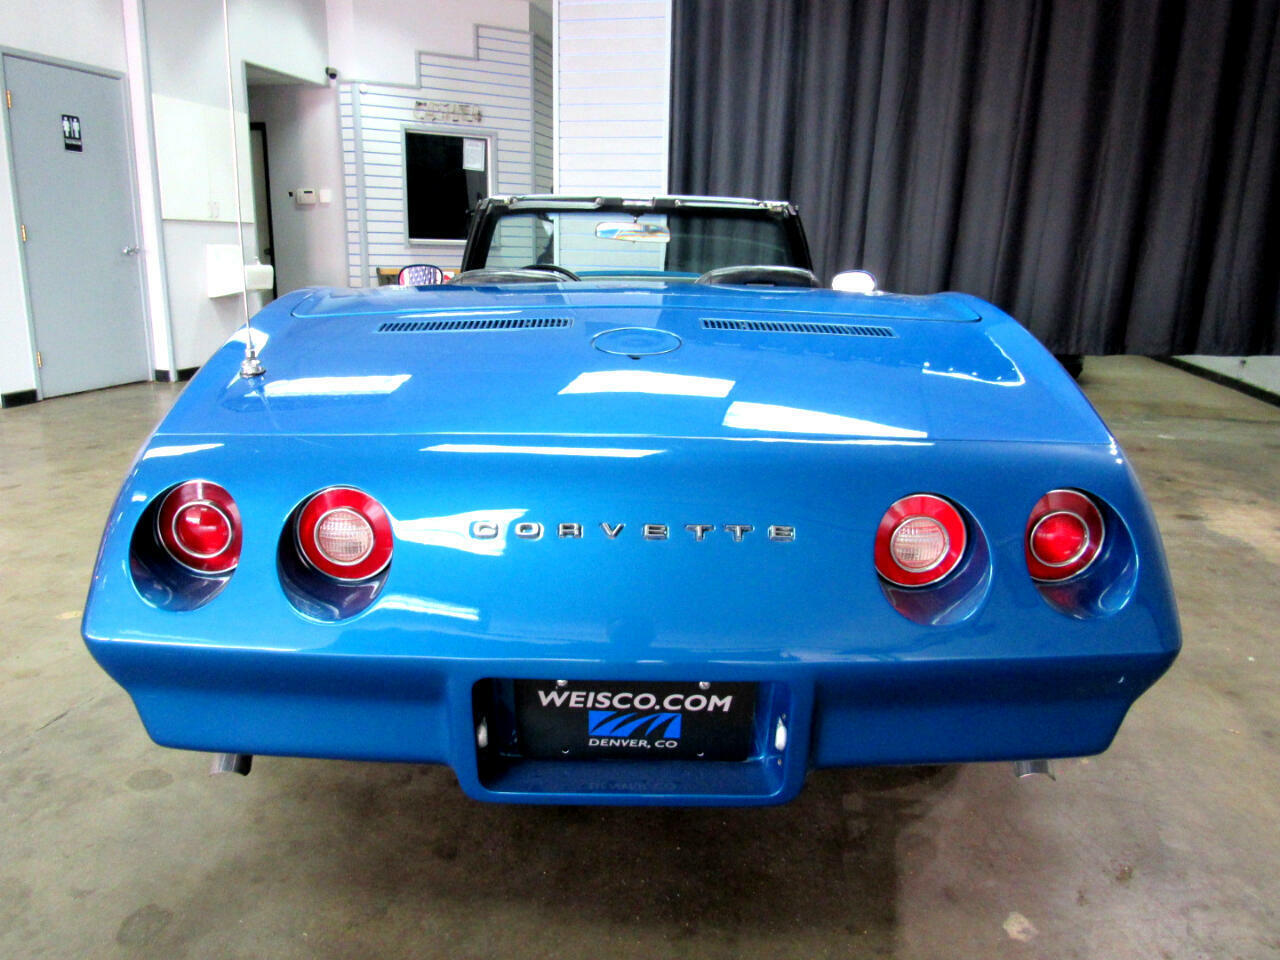 1974 Blue Chevrolet Corvette Convertible  | C3 Corvette Photo 7